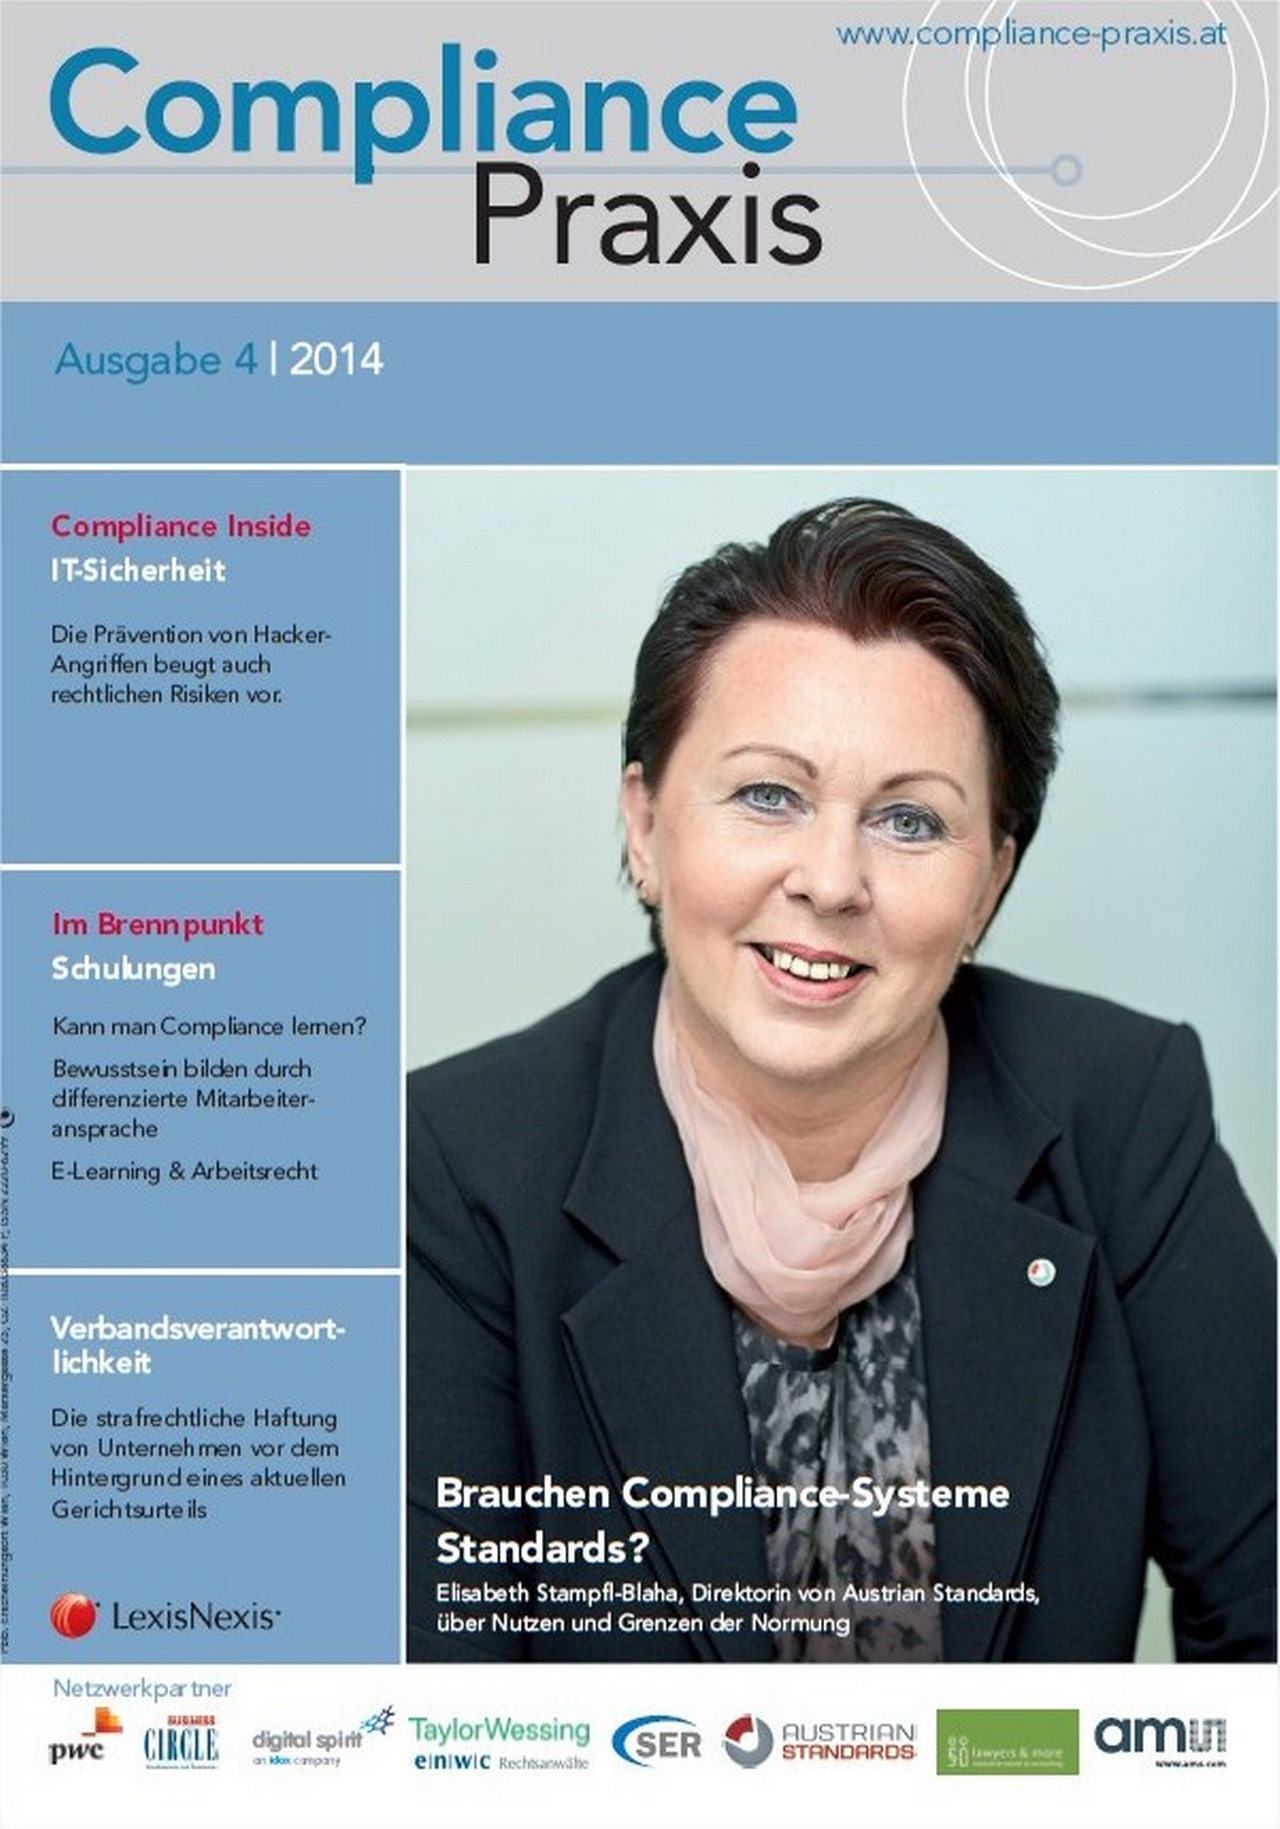 Cover von Compliance Praxis Ausgabe 4/2014, © LexisNexis